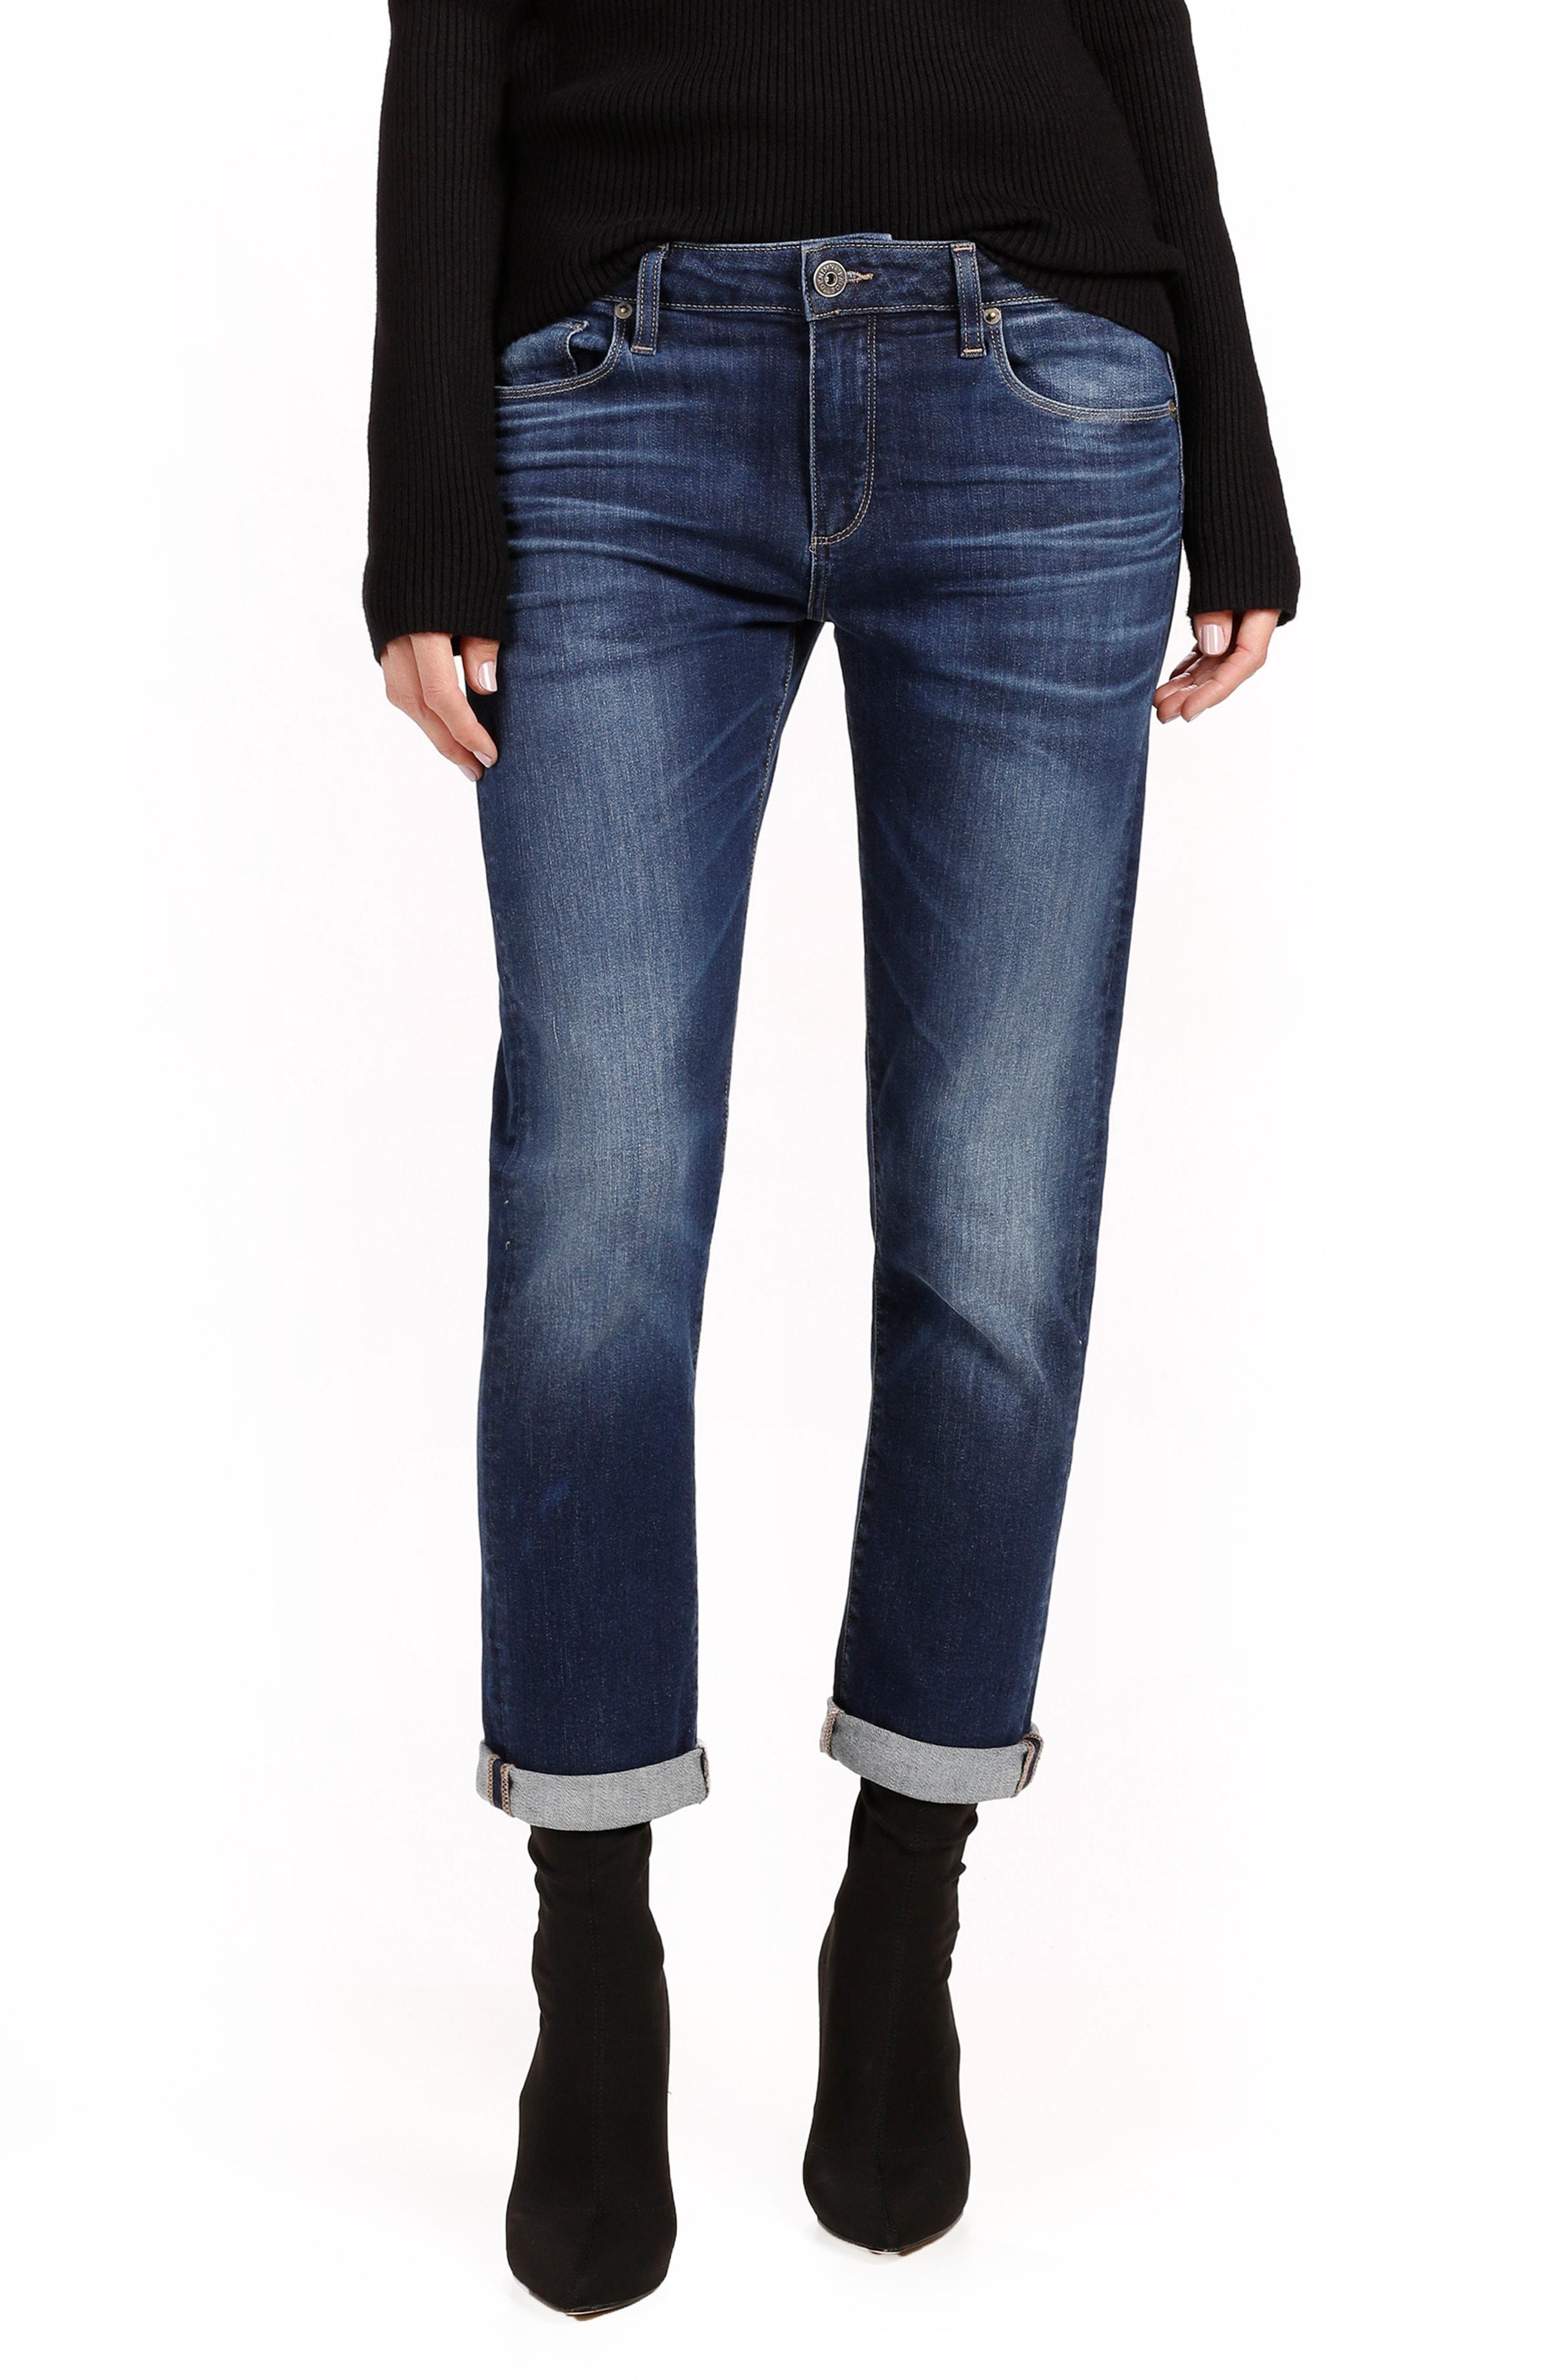 PAIGE Women's & Men's Clothing | Nordstrom